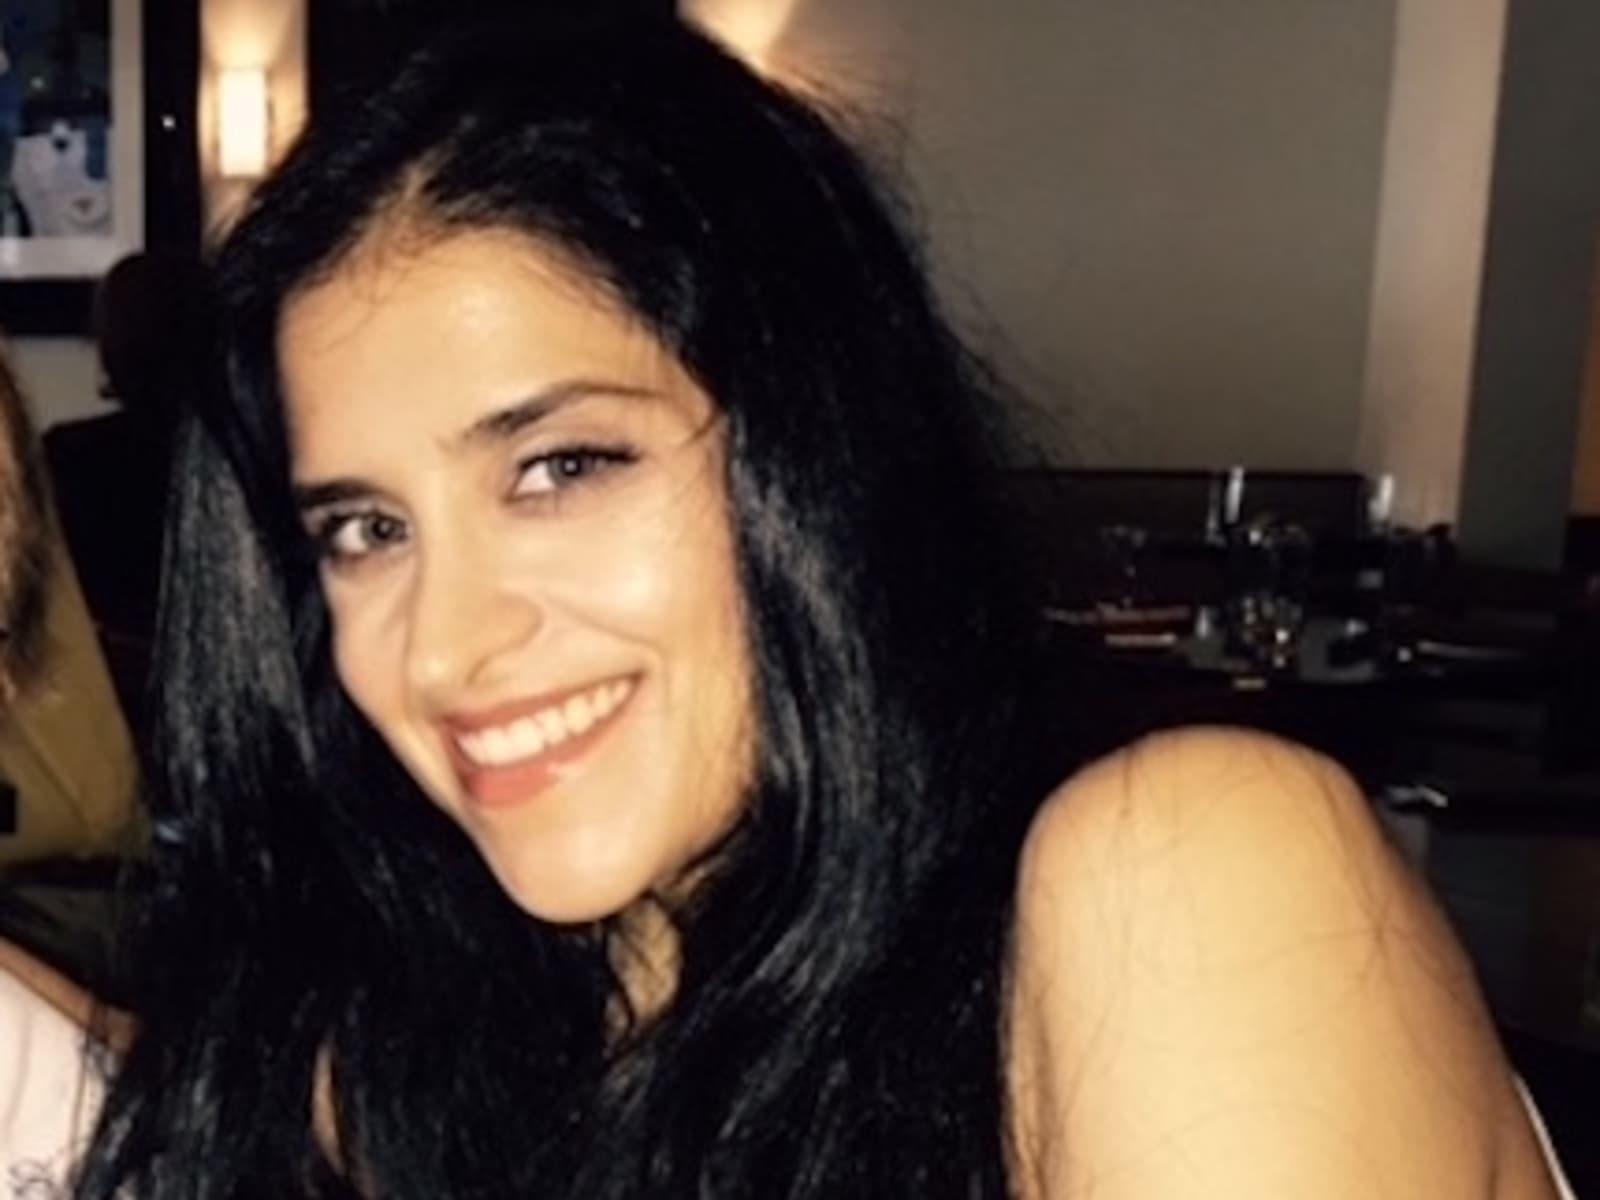 Meera from Brooklyn, New York, United States